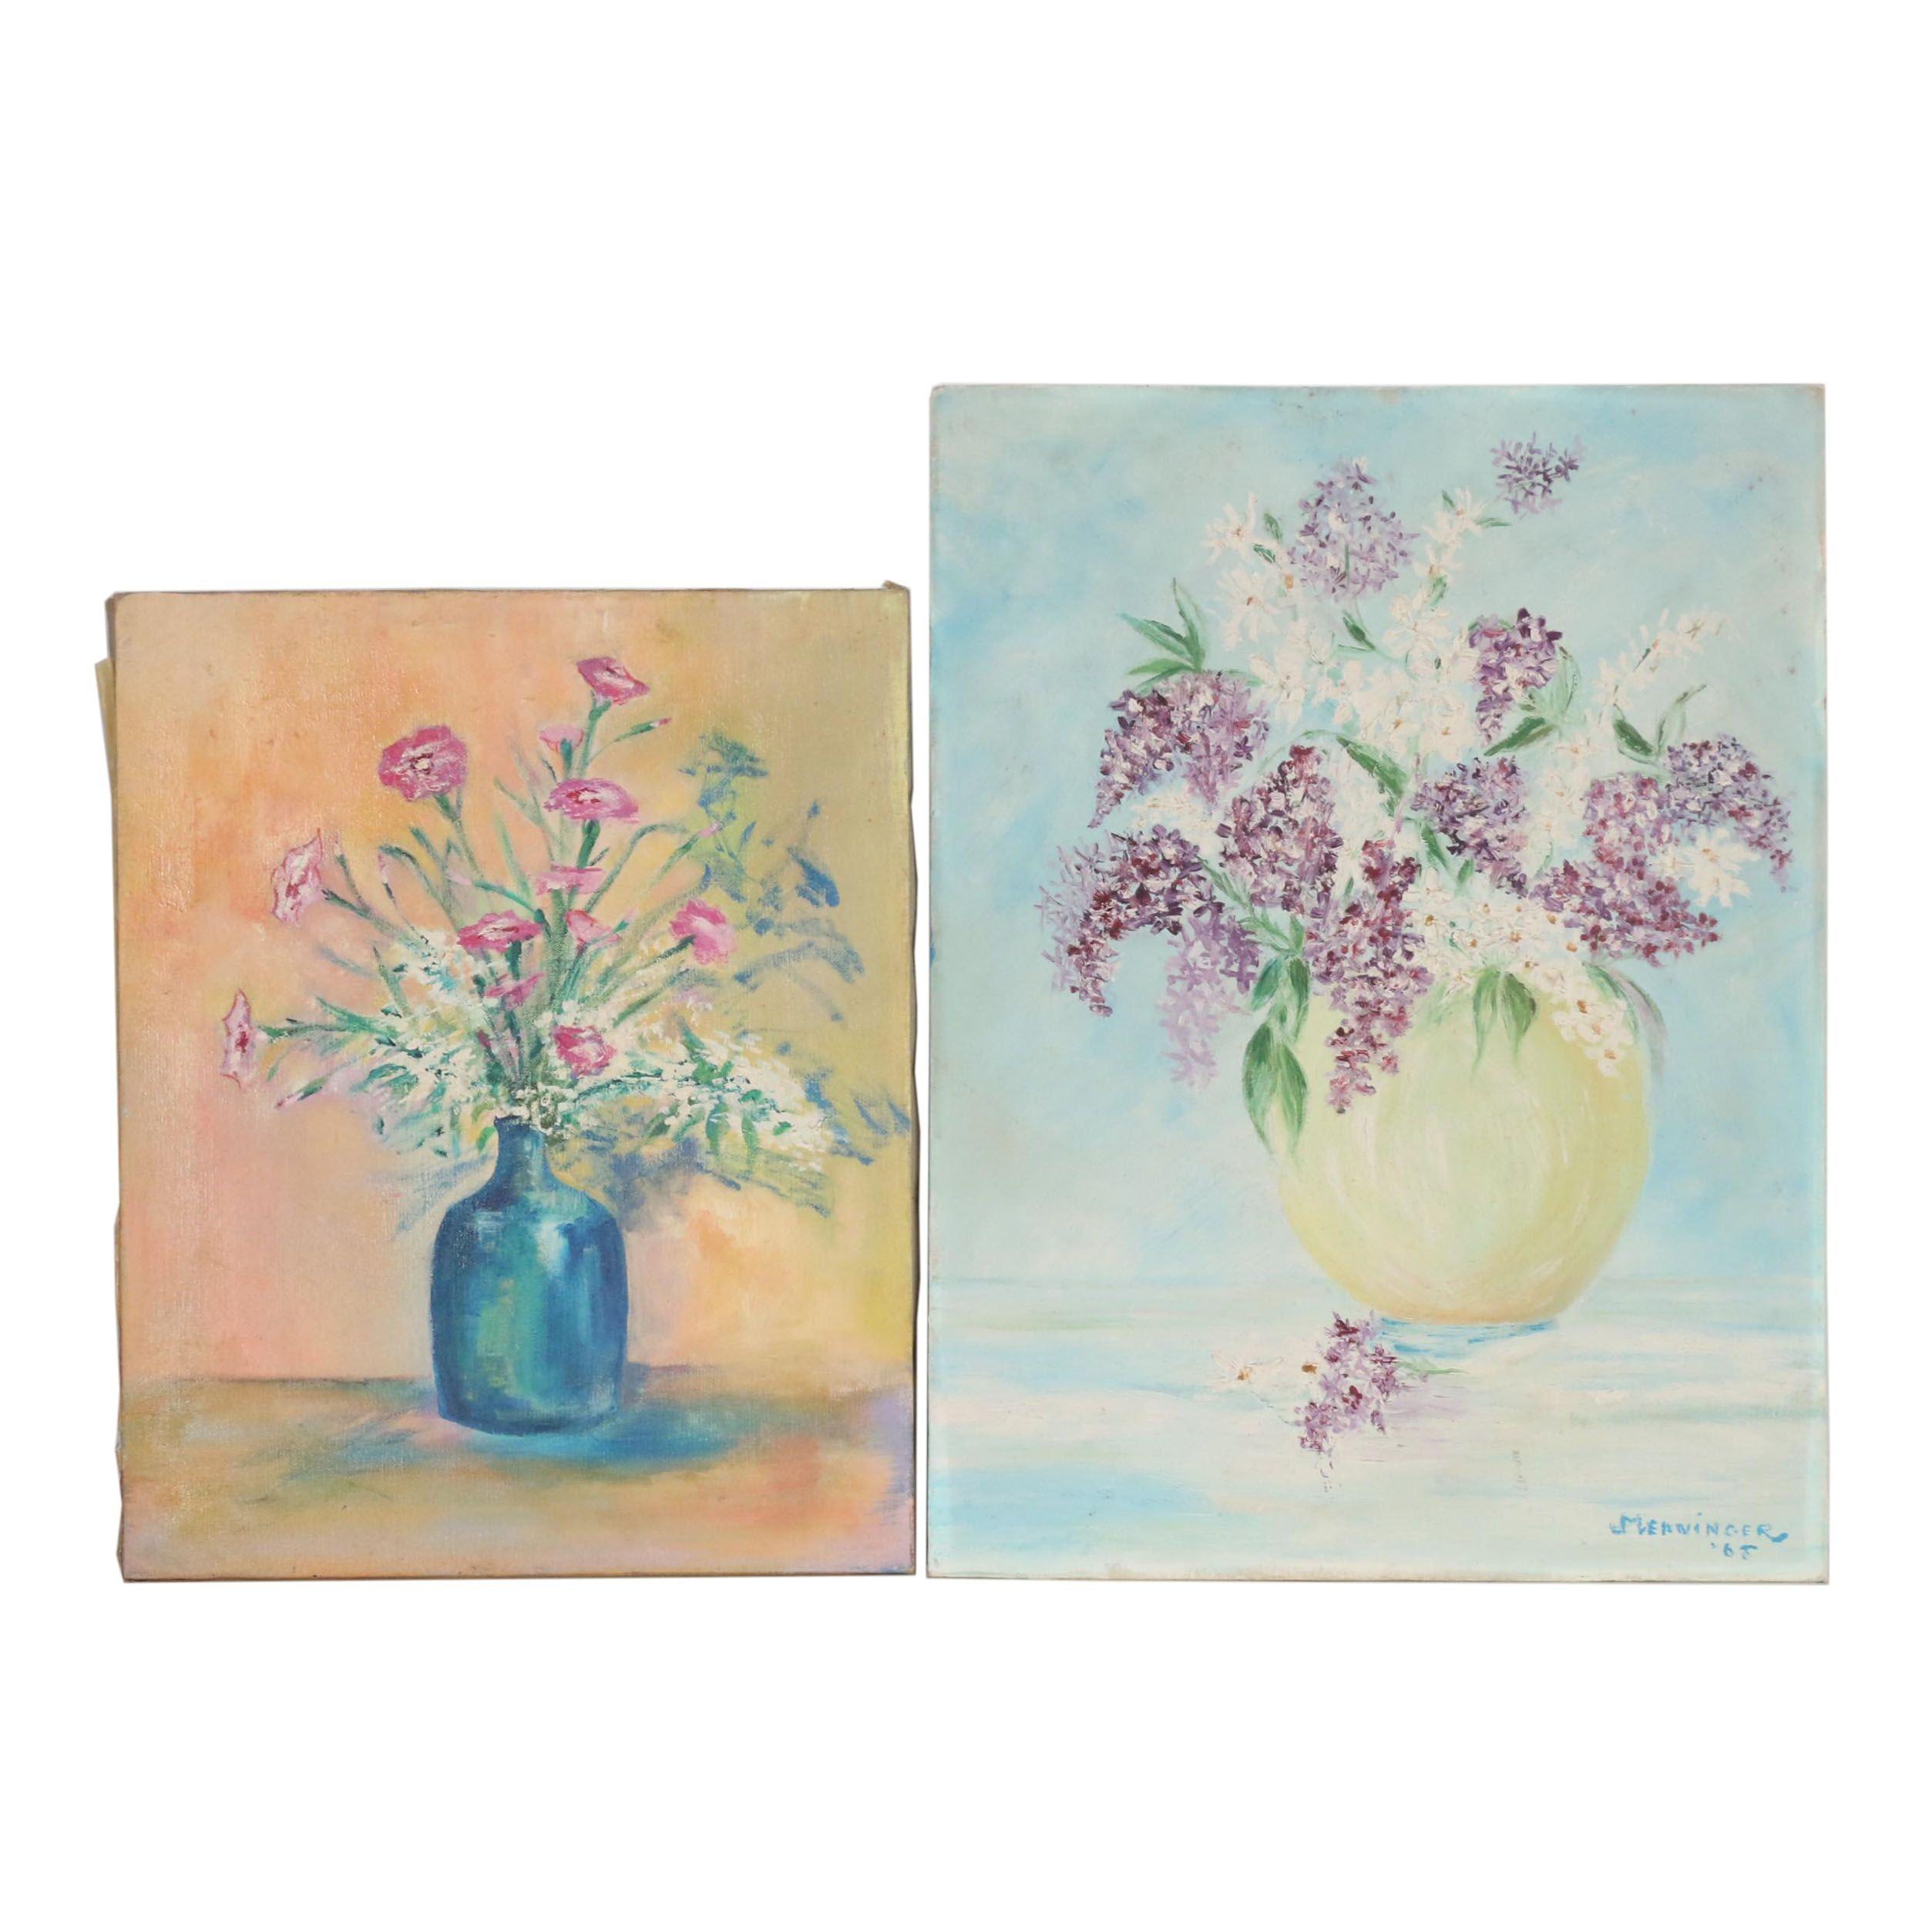 Mid-Late 20th Century Still Life Oil Paintings